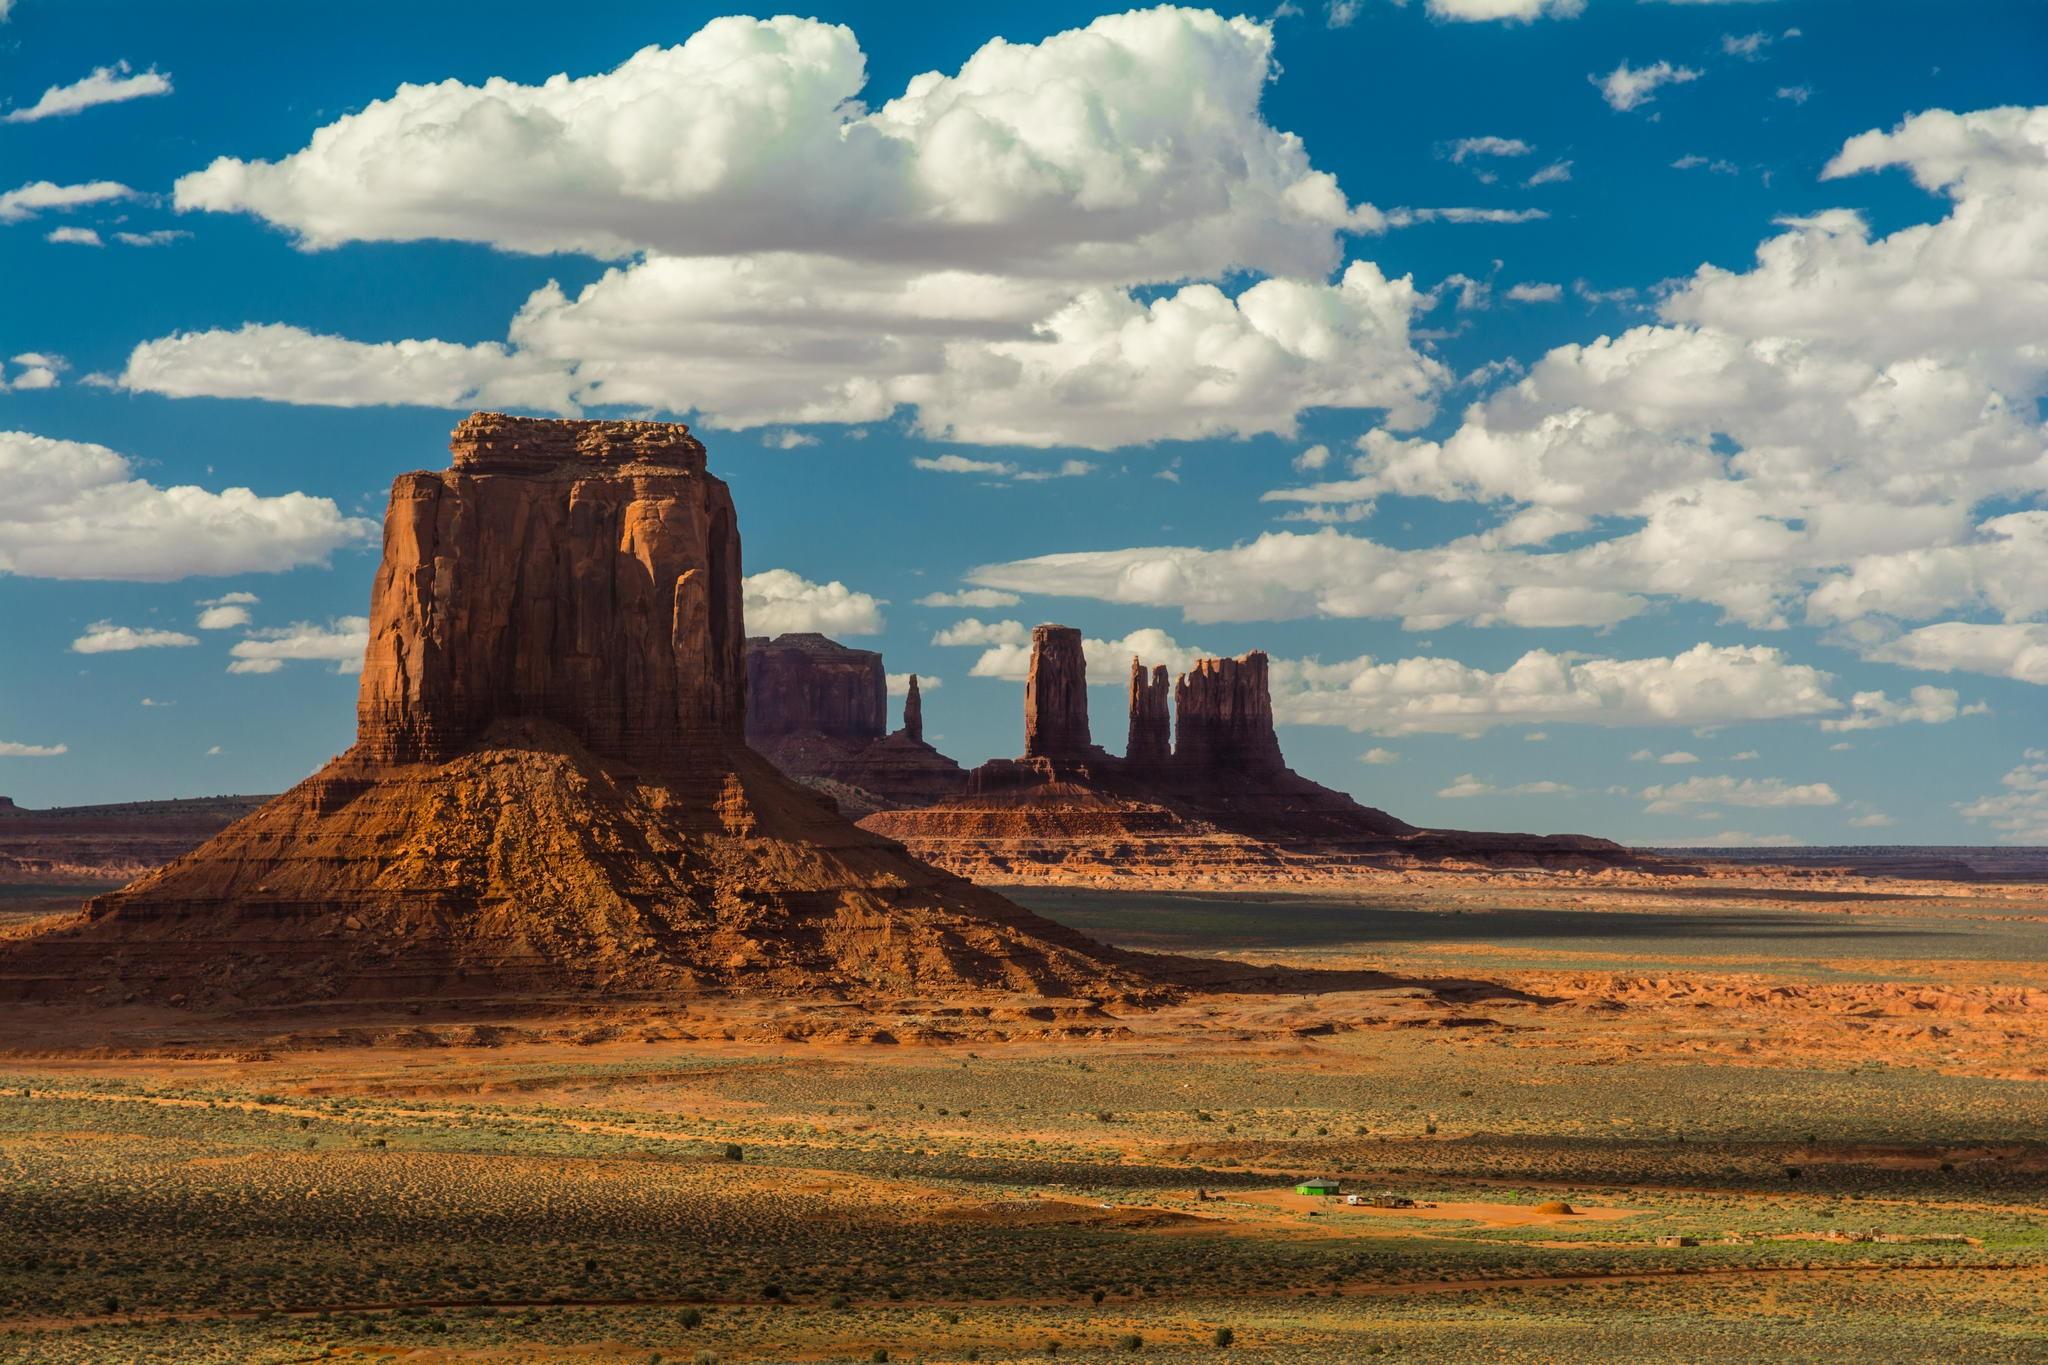 Landscape Hill Rock Sky Desert Horizon Valley Monument Plateau Steppe Cloud Butte Landmark Plain Prairie